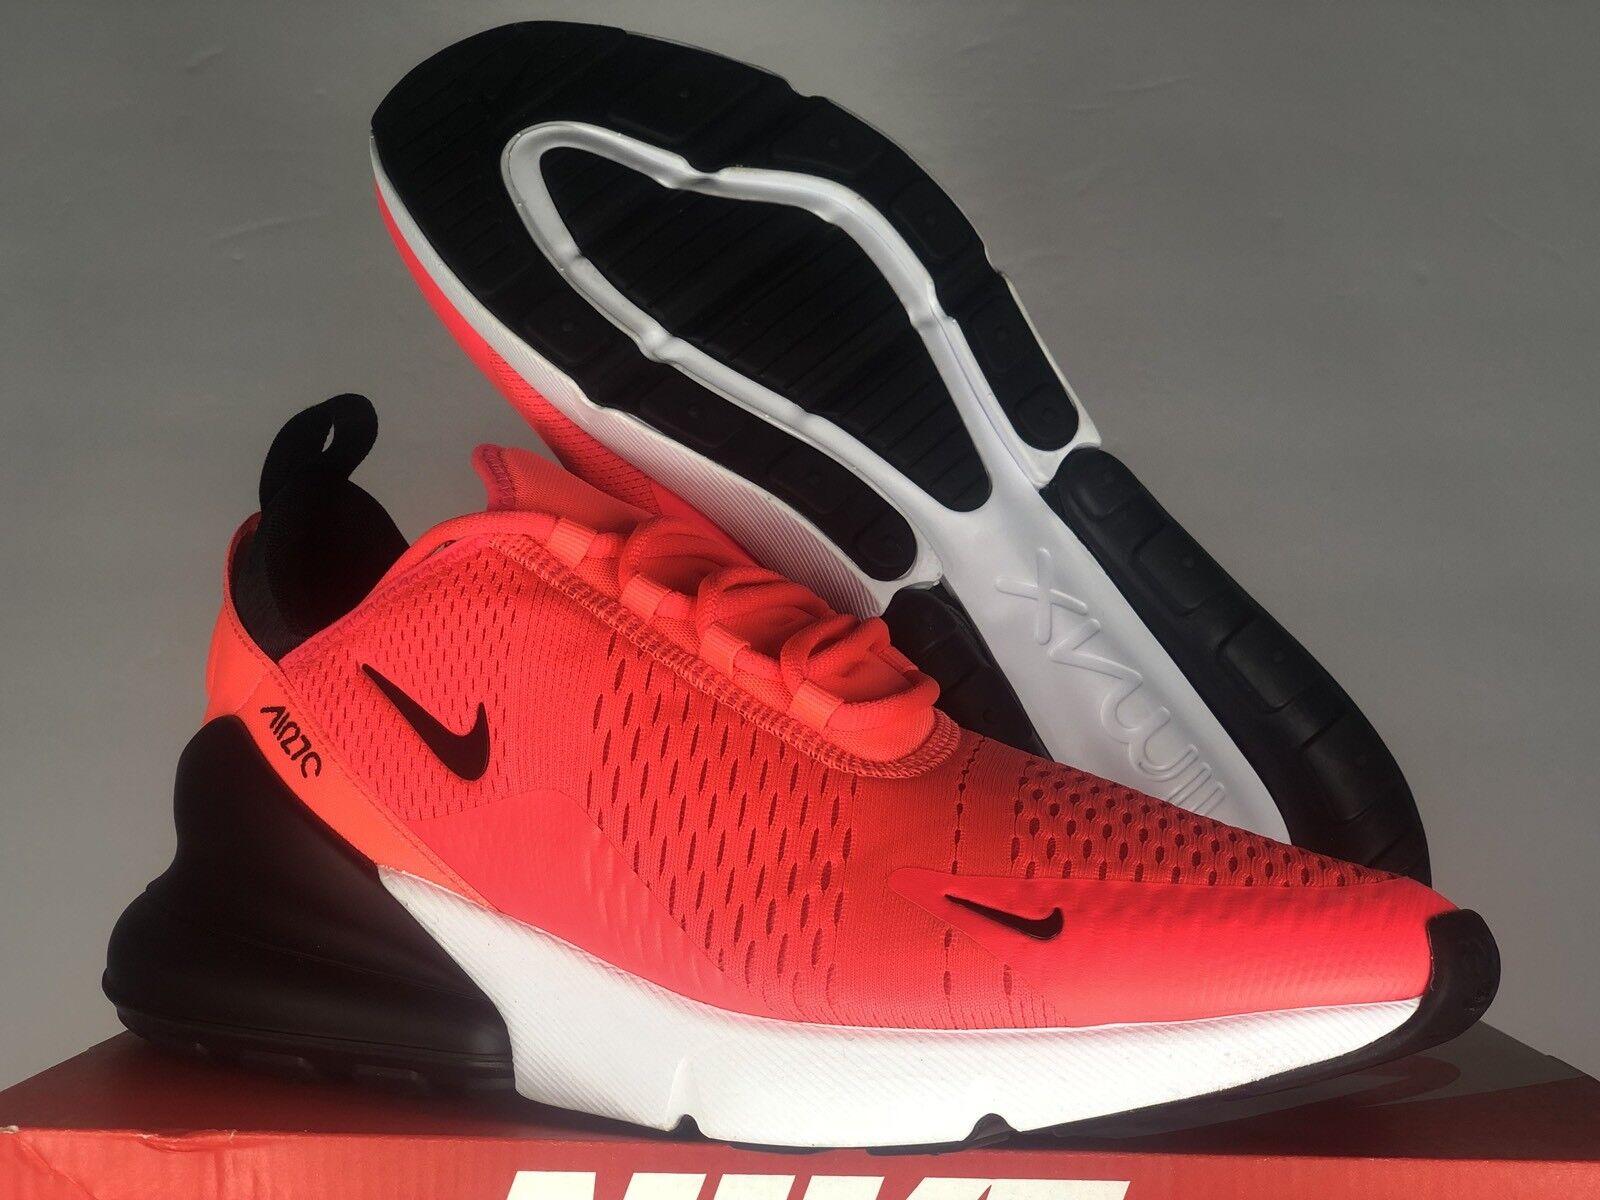 5f5caaffcd Men's NIKE AIR MAX 270 ID-Infrared Black Sz 12 [BQ0742-997] nccbdx9085-Athletic  Shoes